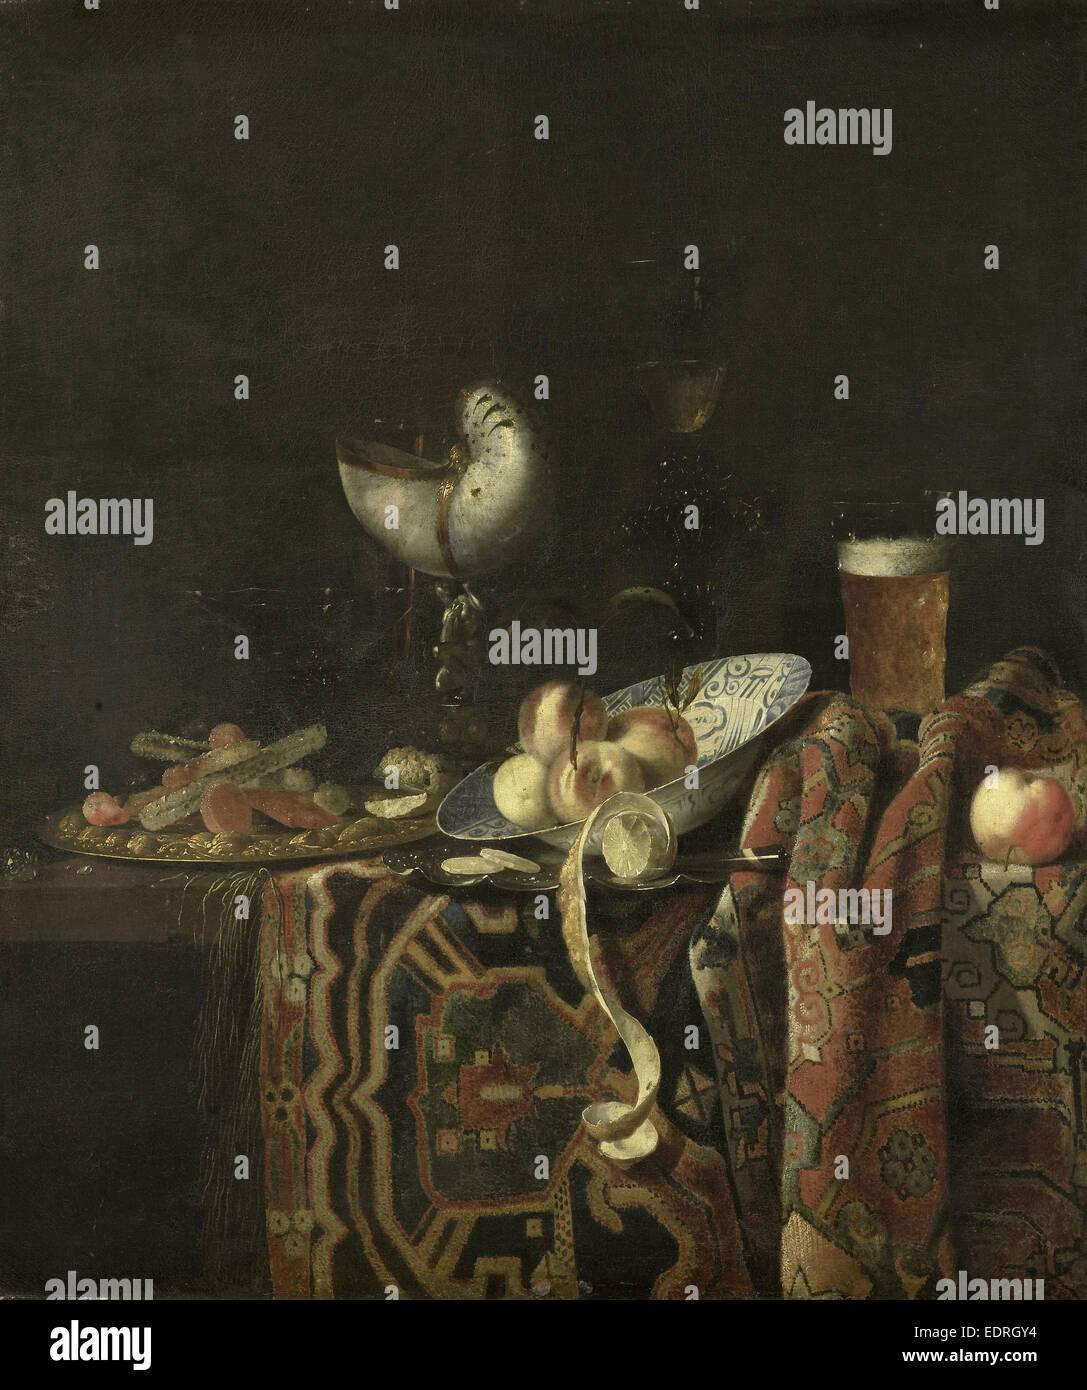 Still Life, Georg Hainz, 1666 - 1700 Photo Stock